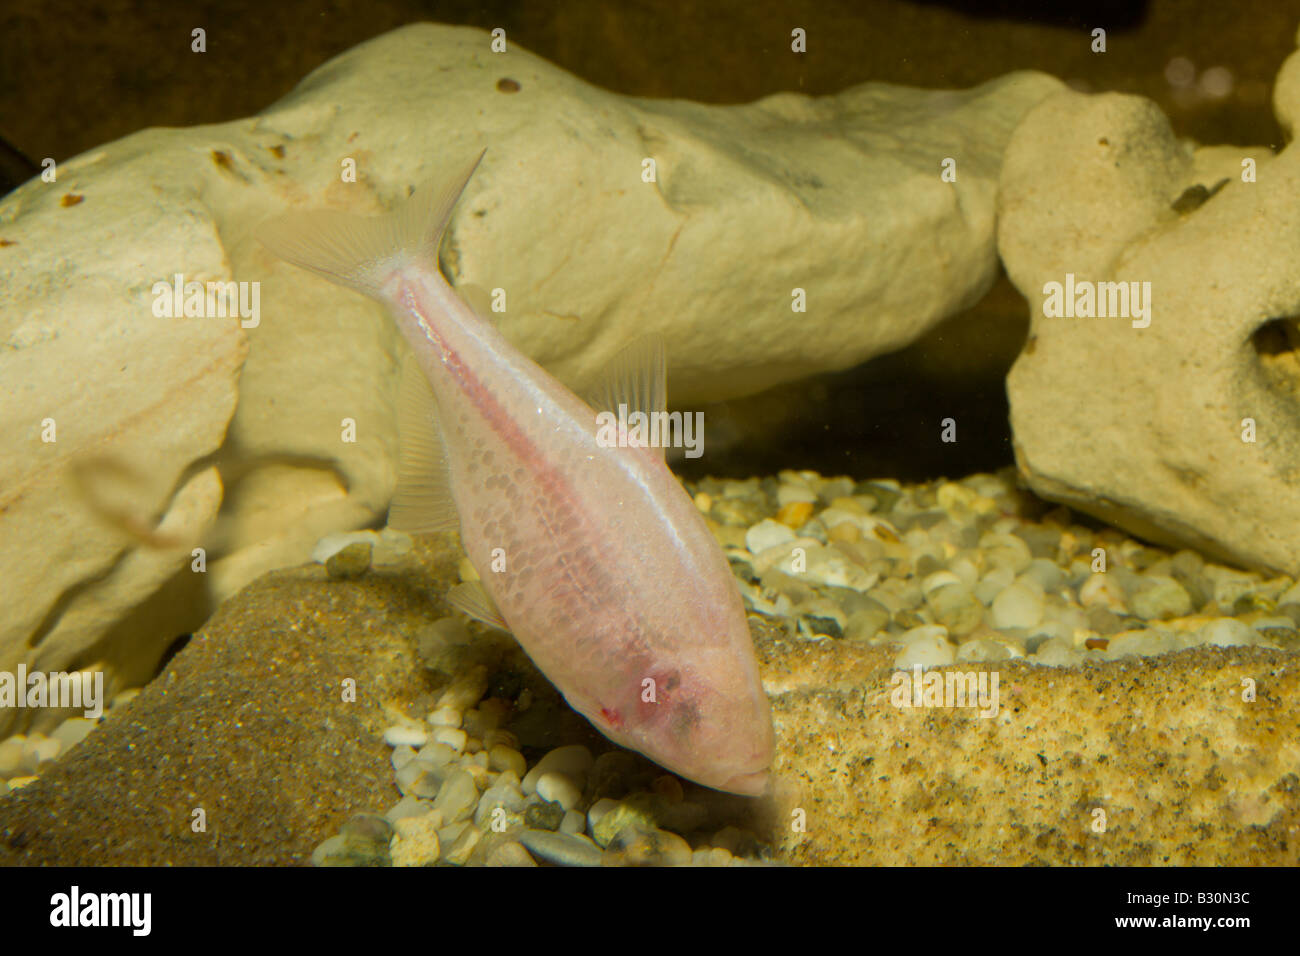 Blind cavefish Anoptichthys jordani Astyanax fasciatus mexicanus Mexico Underwater cave - Stock Image